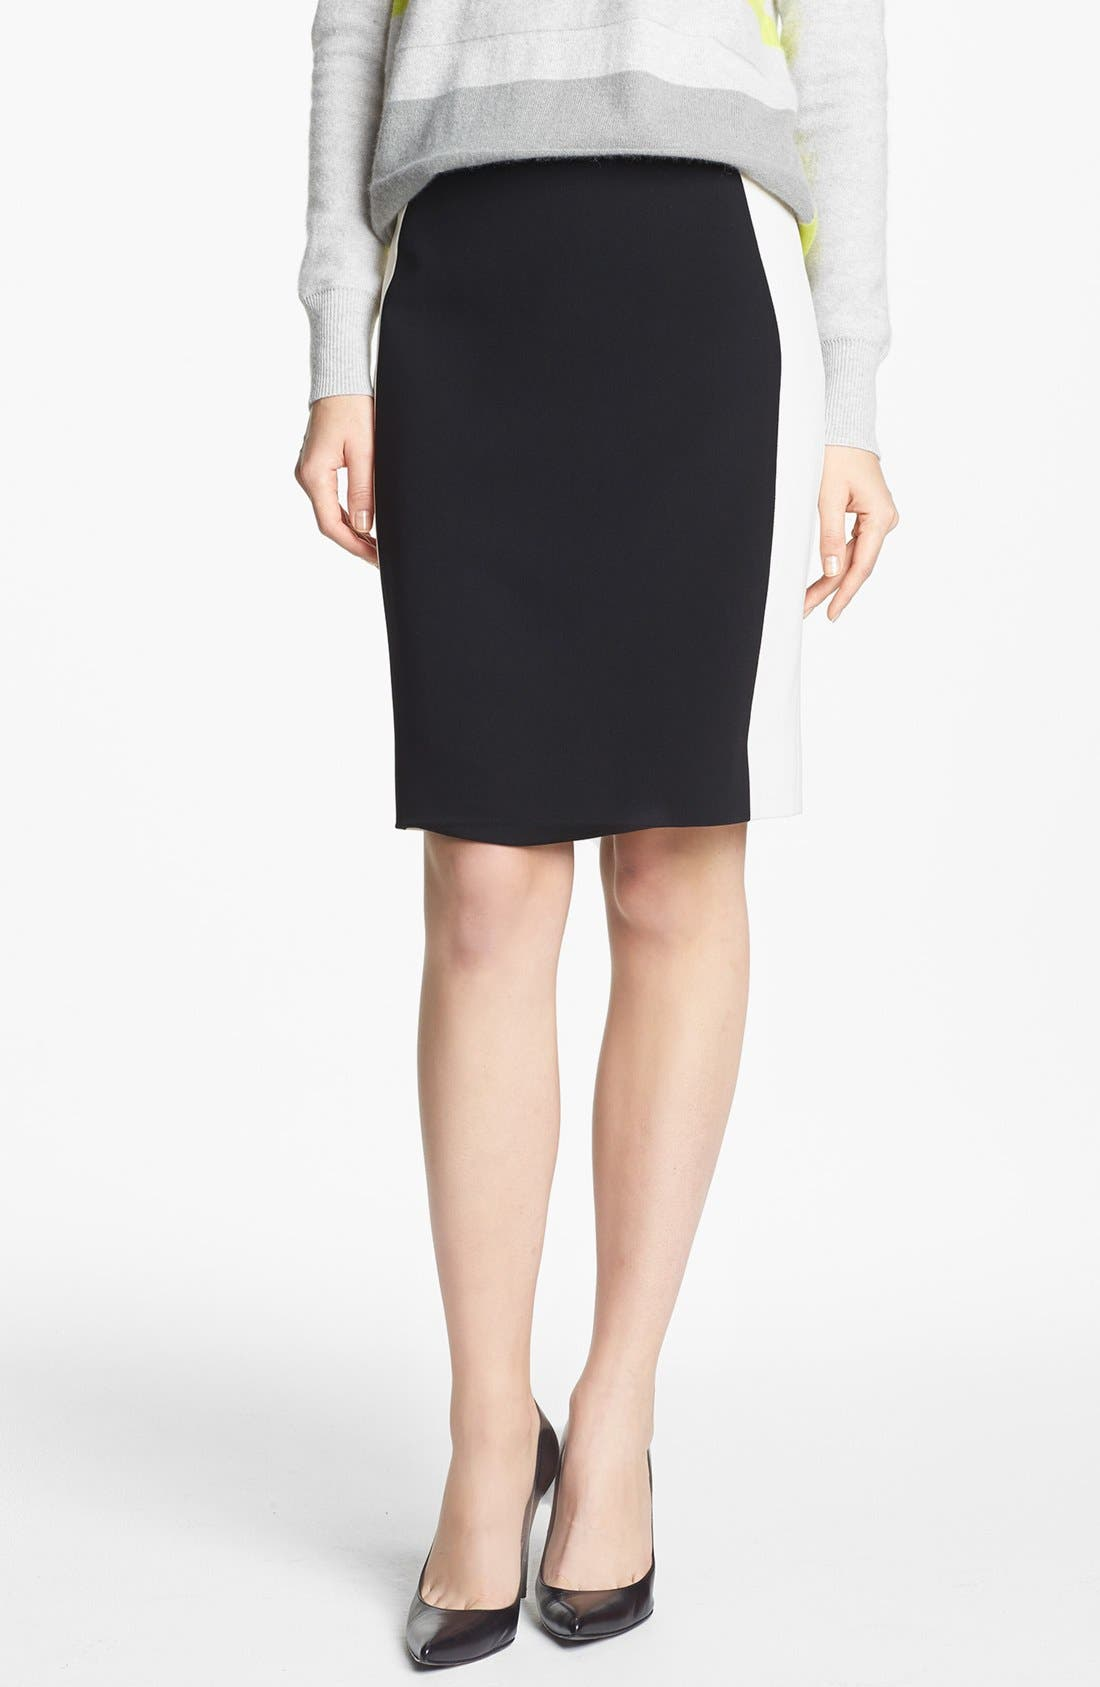 Alternate Image 1 Selected - Diane von Furstenberg 'Ulyssa' Skirt